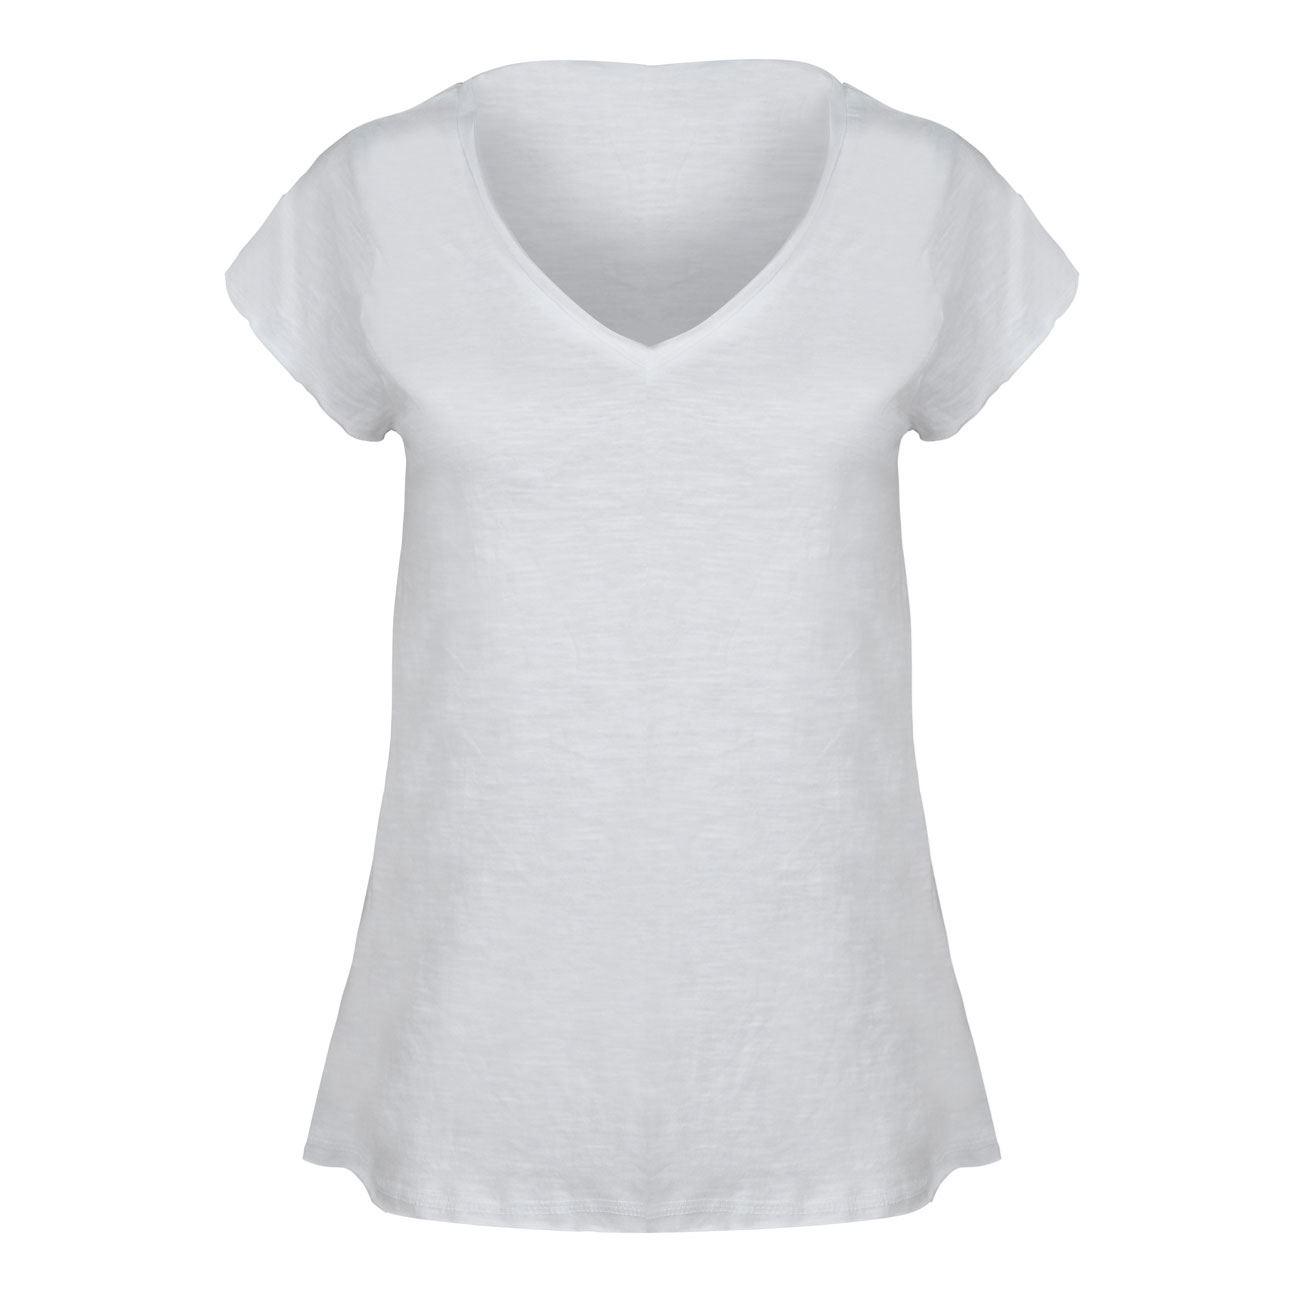 cafff1fb5457 Μπλούζα Γυναικεία Κοντό Μανίκι Λευκή Slub   Μπλούζες Κοντομάνικες Με  Λαιμόκοψη Τύπου V